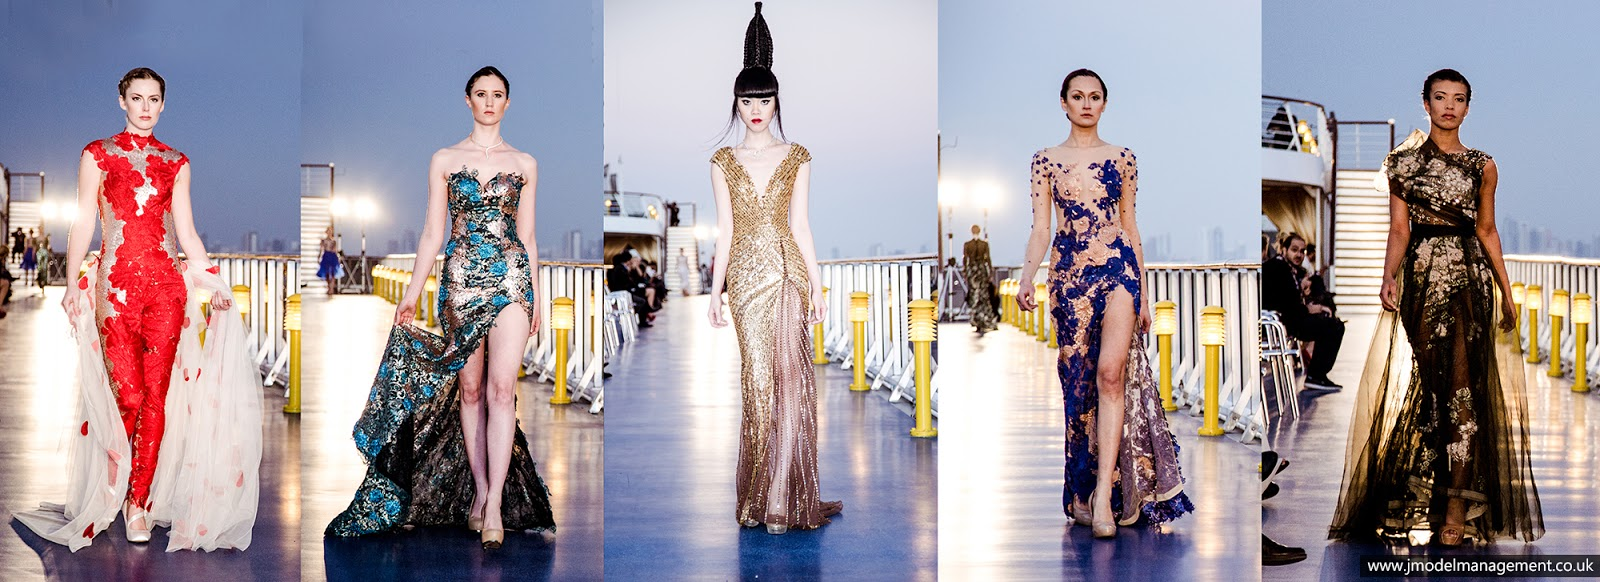 WTFSG-j-winter-fashion-show-on-costa-atlantica-Hoang-Hai